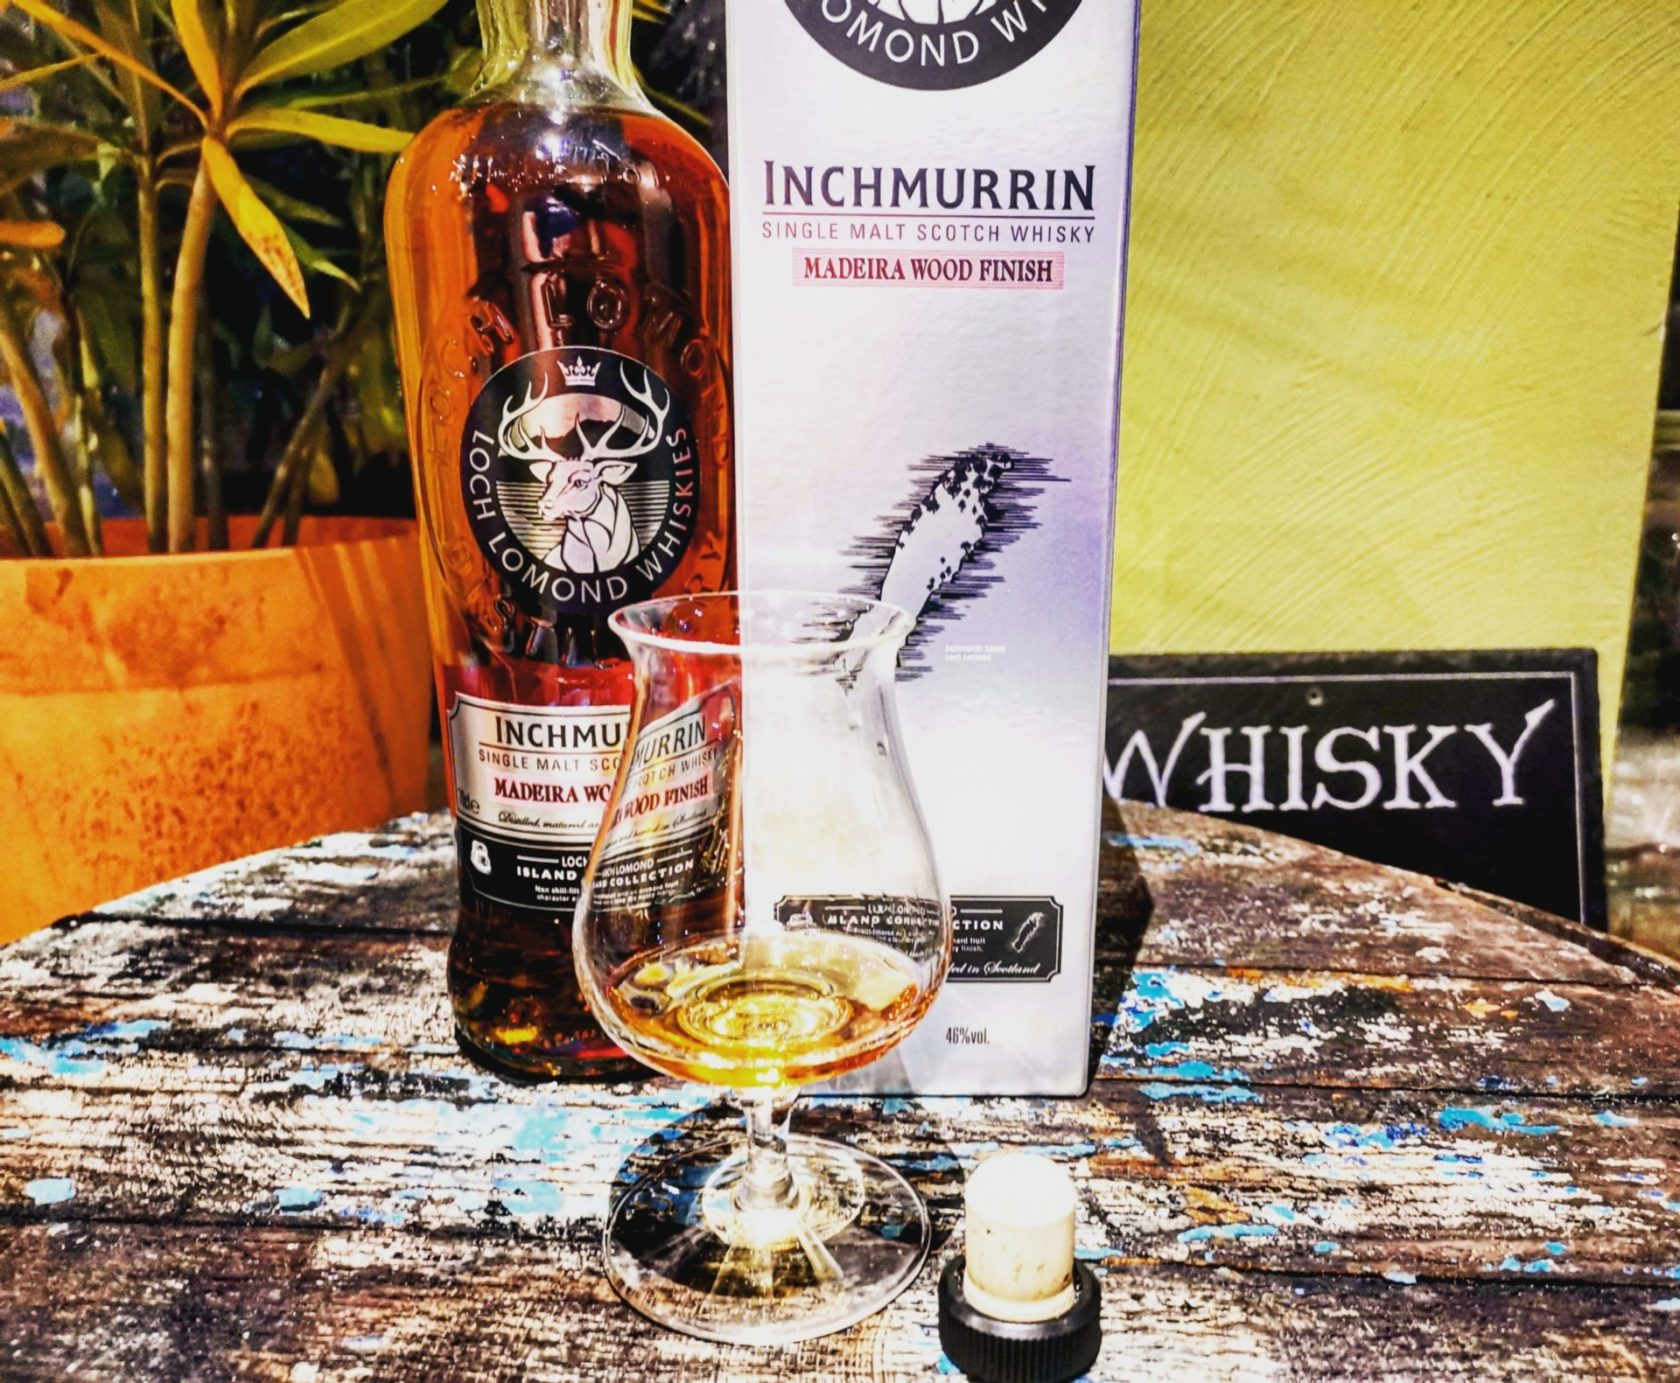 Inchmurrin Madeira Wood Finish Single Malt Scotch Whisky